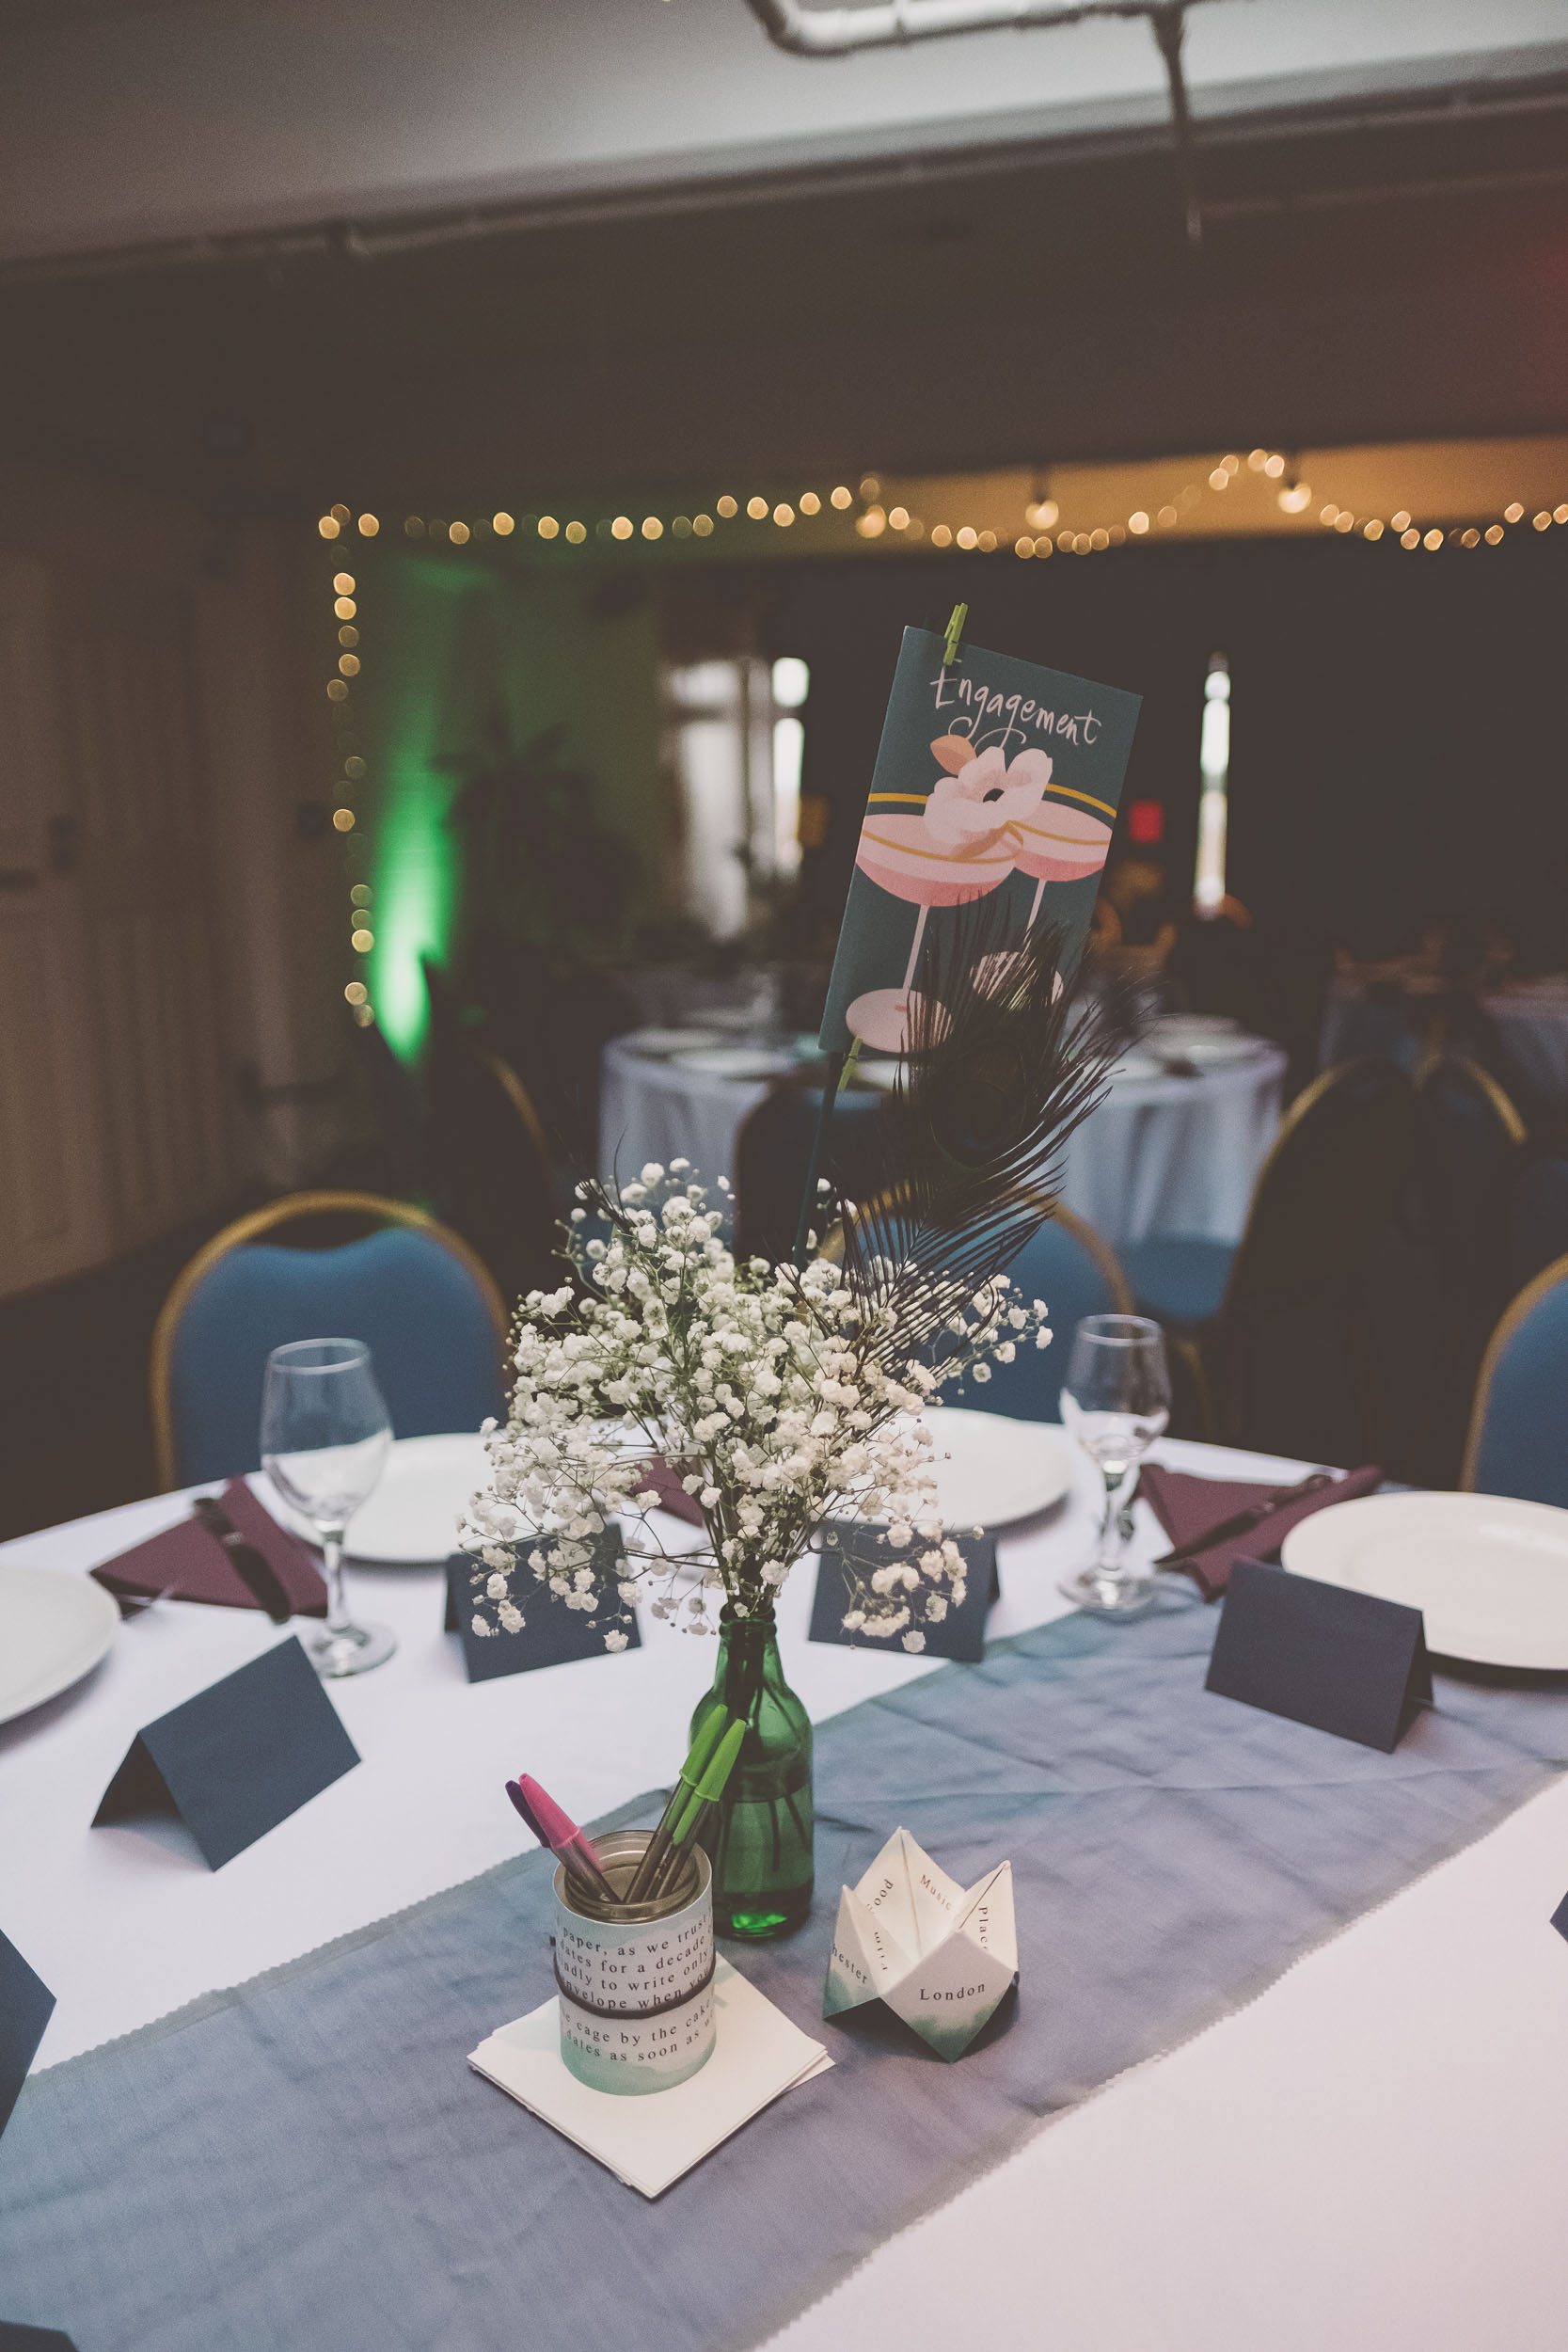 islington-town-hall-4th-floor-studios-wedding233.jpg